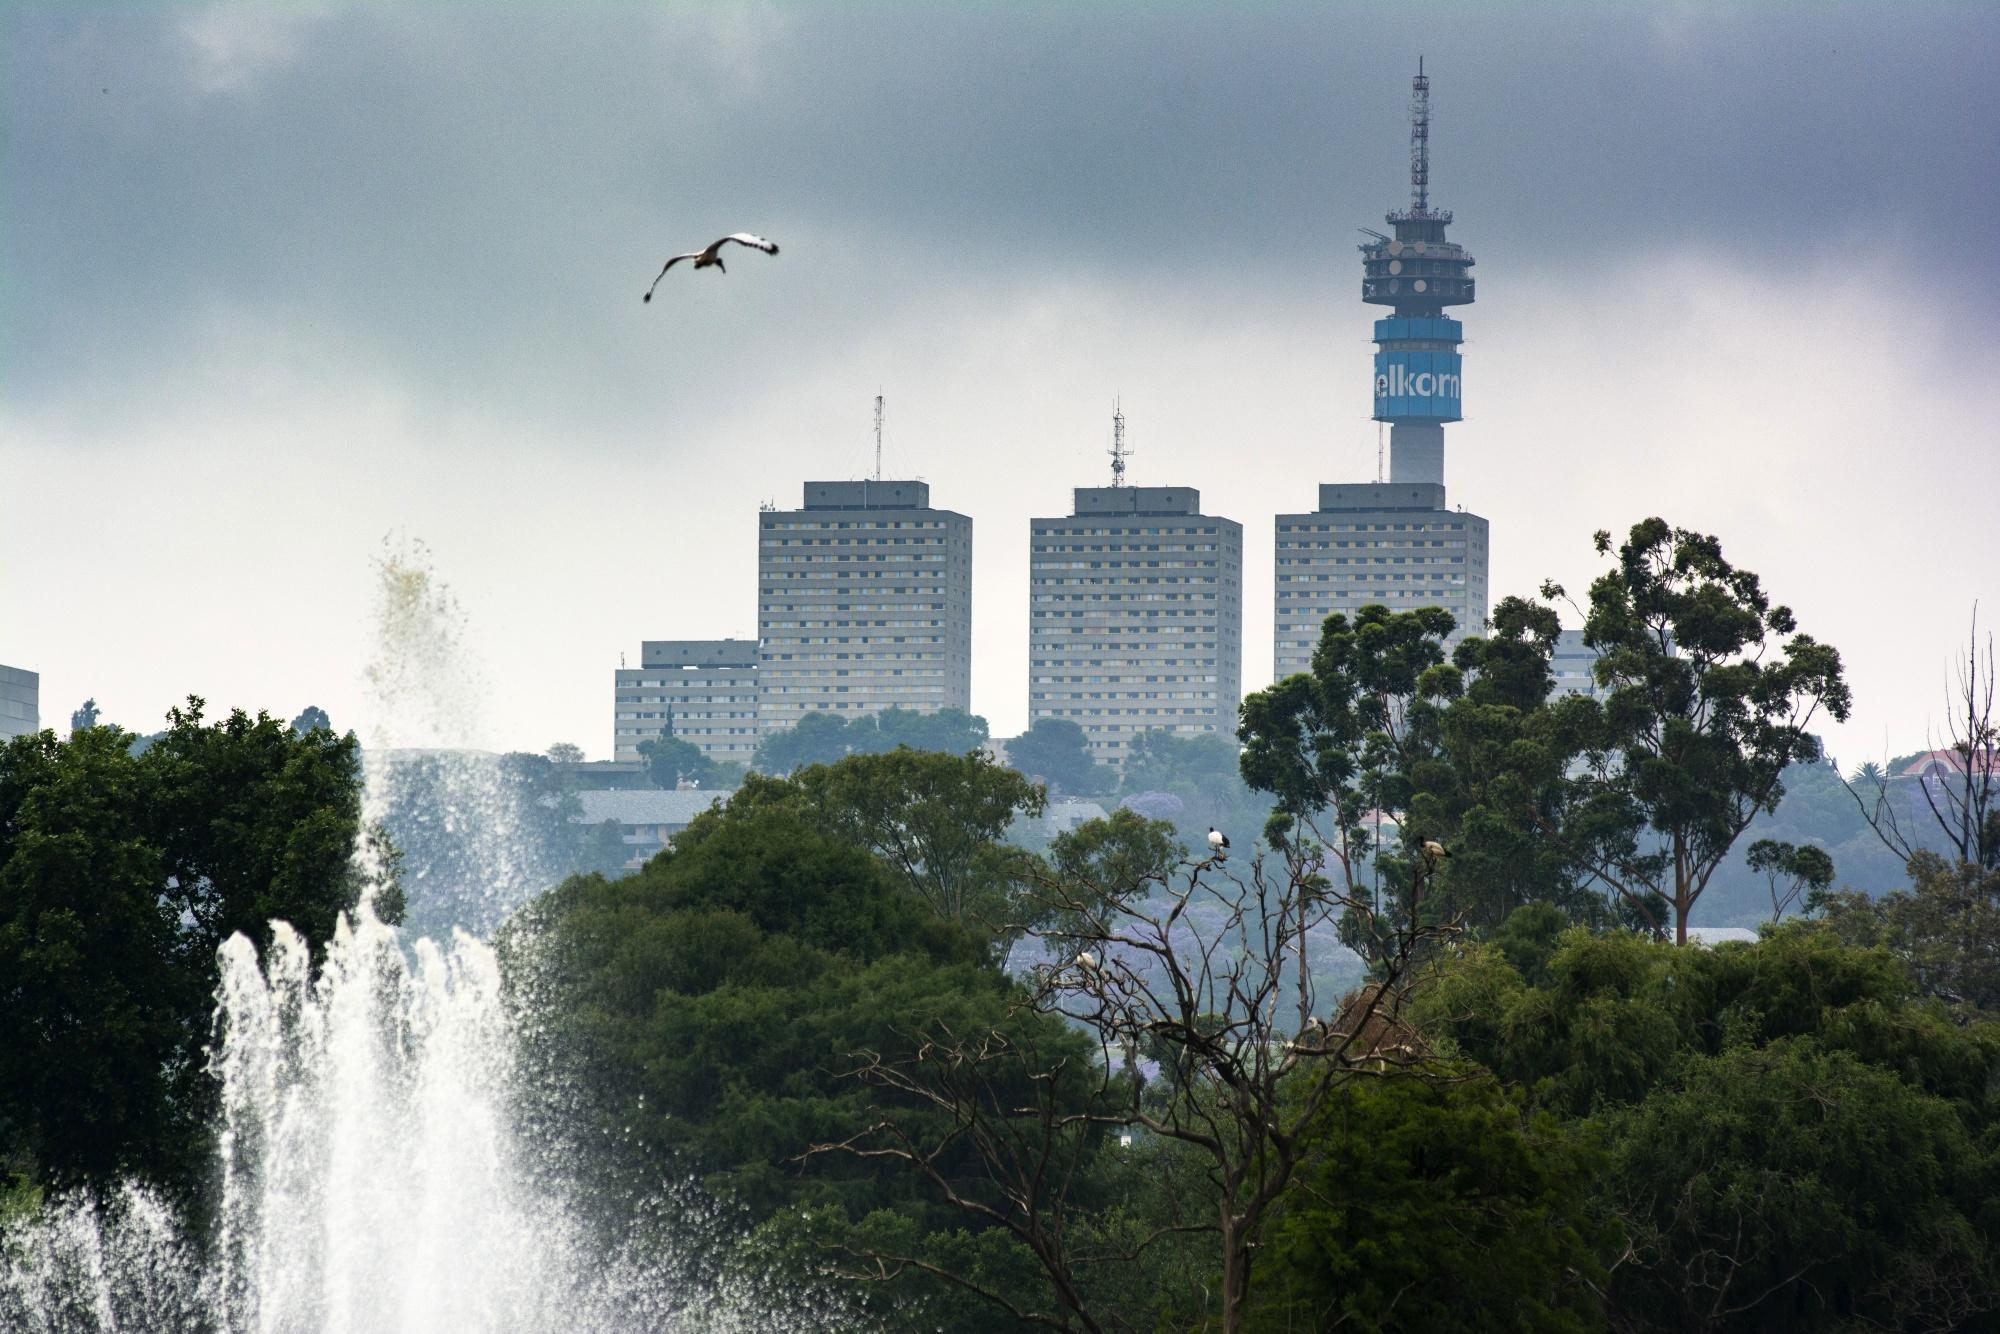 The Telkom Tower and city tower blocks inJohannesburg.